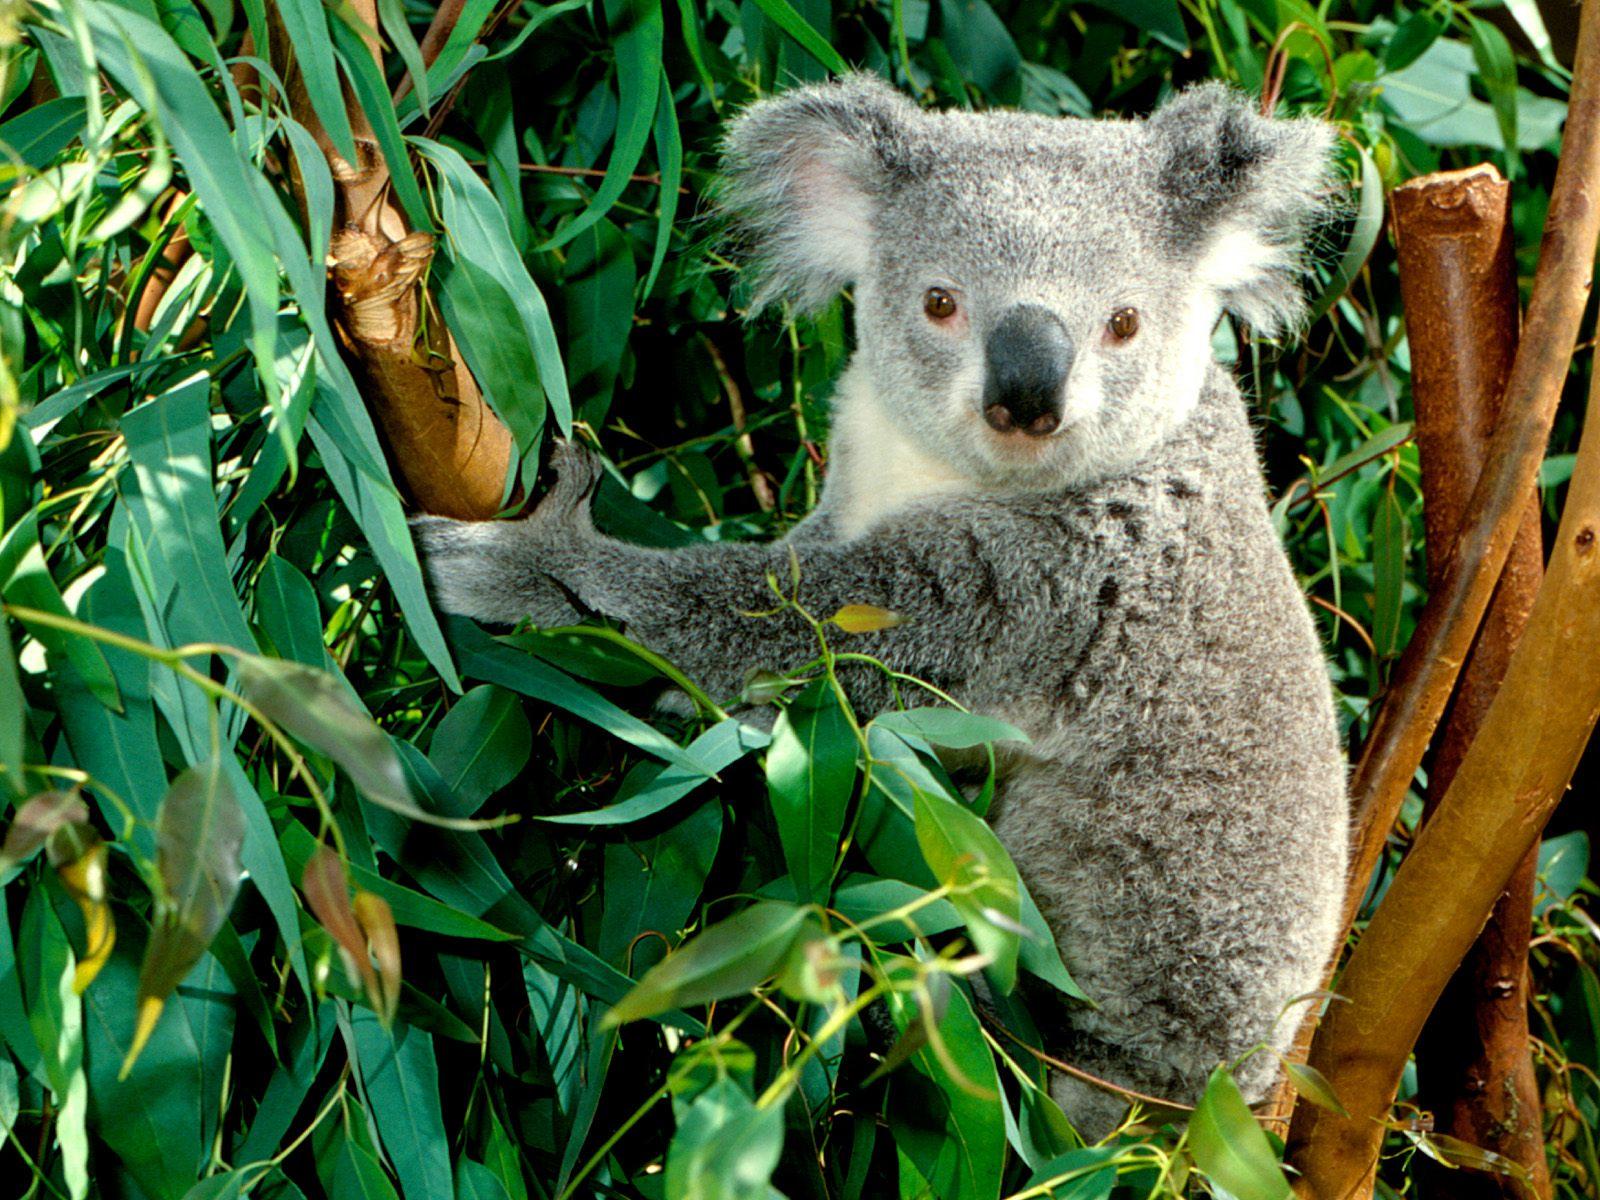 Koala Wallpaper Fun Animals Wiki Videos Pictures Stories 1600x1200